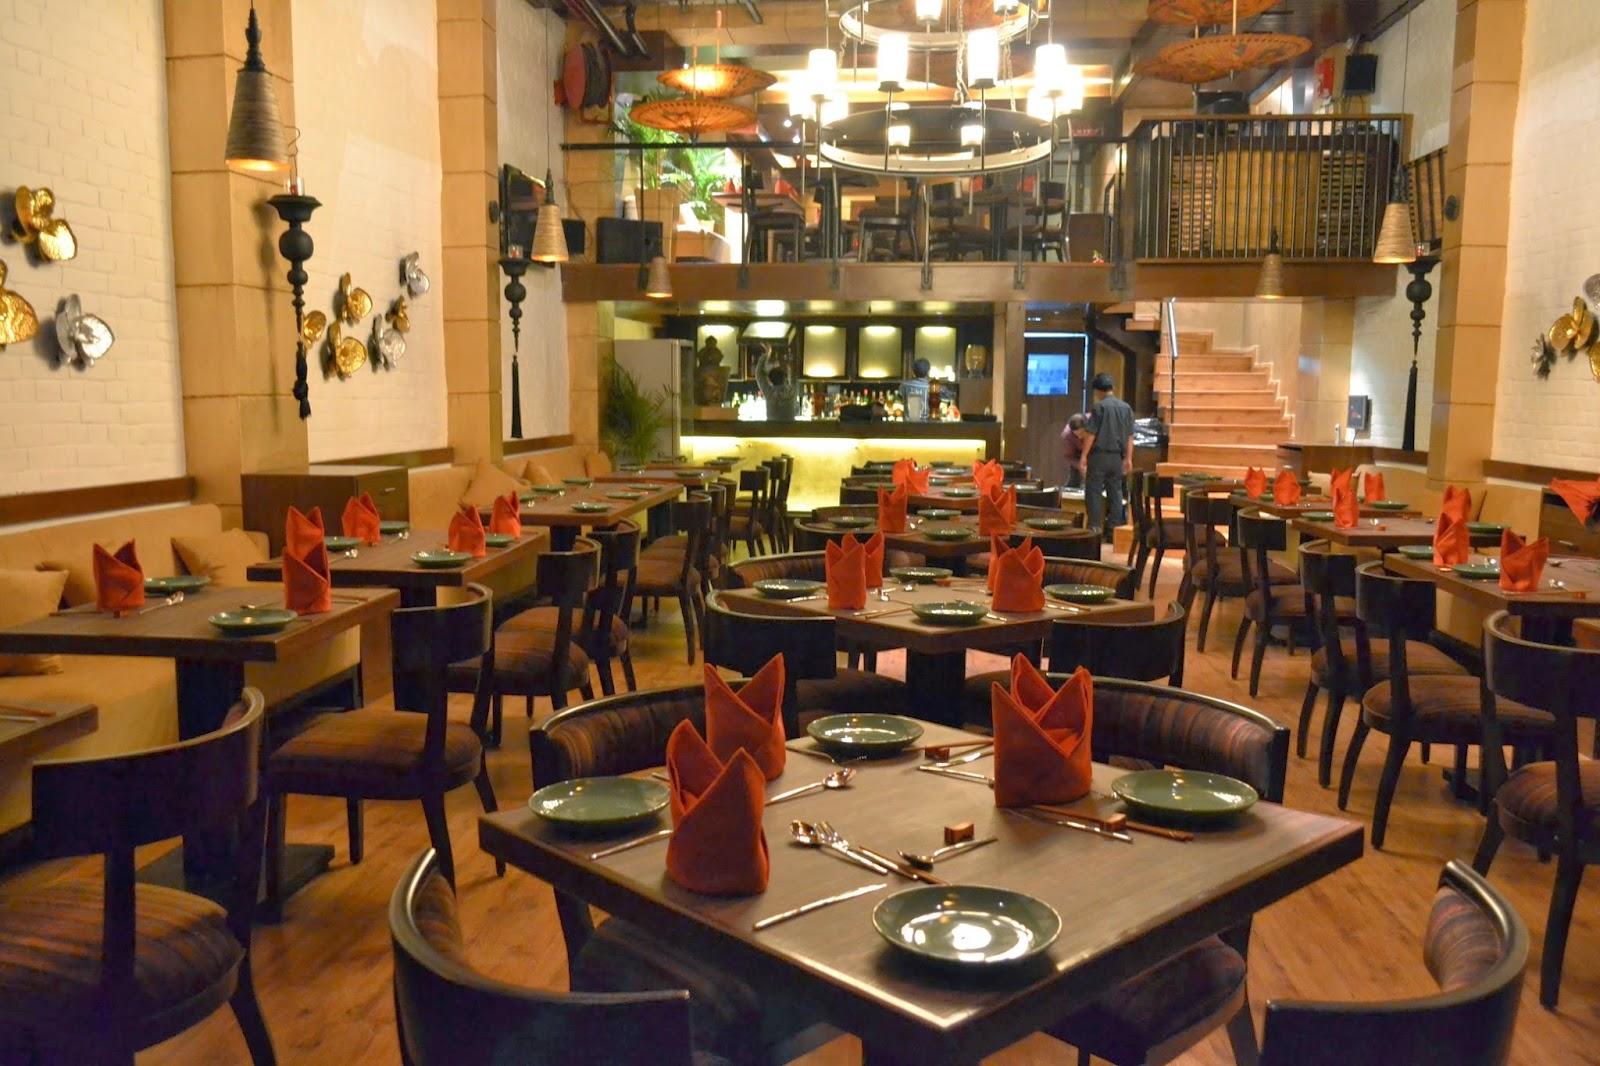 China house restaurant baltimore md